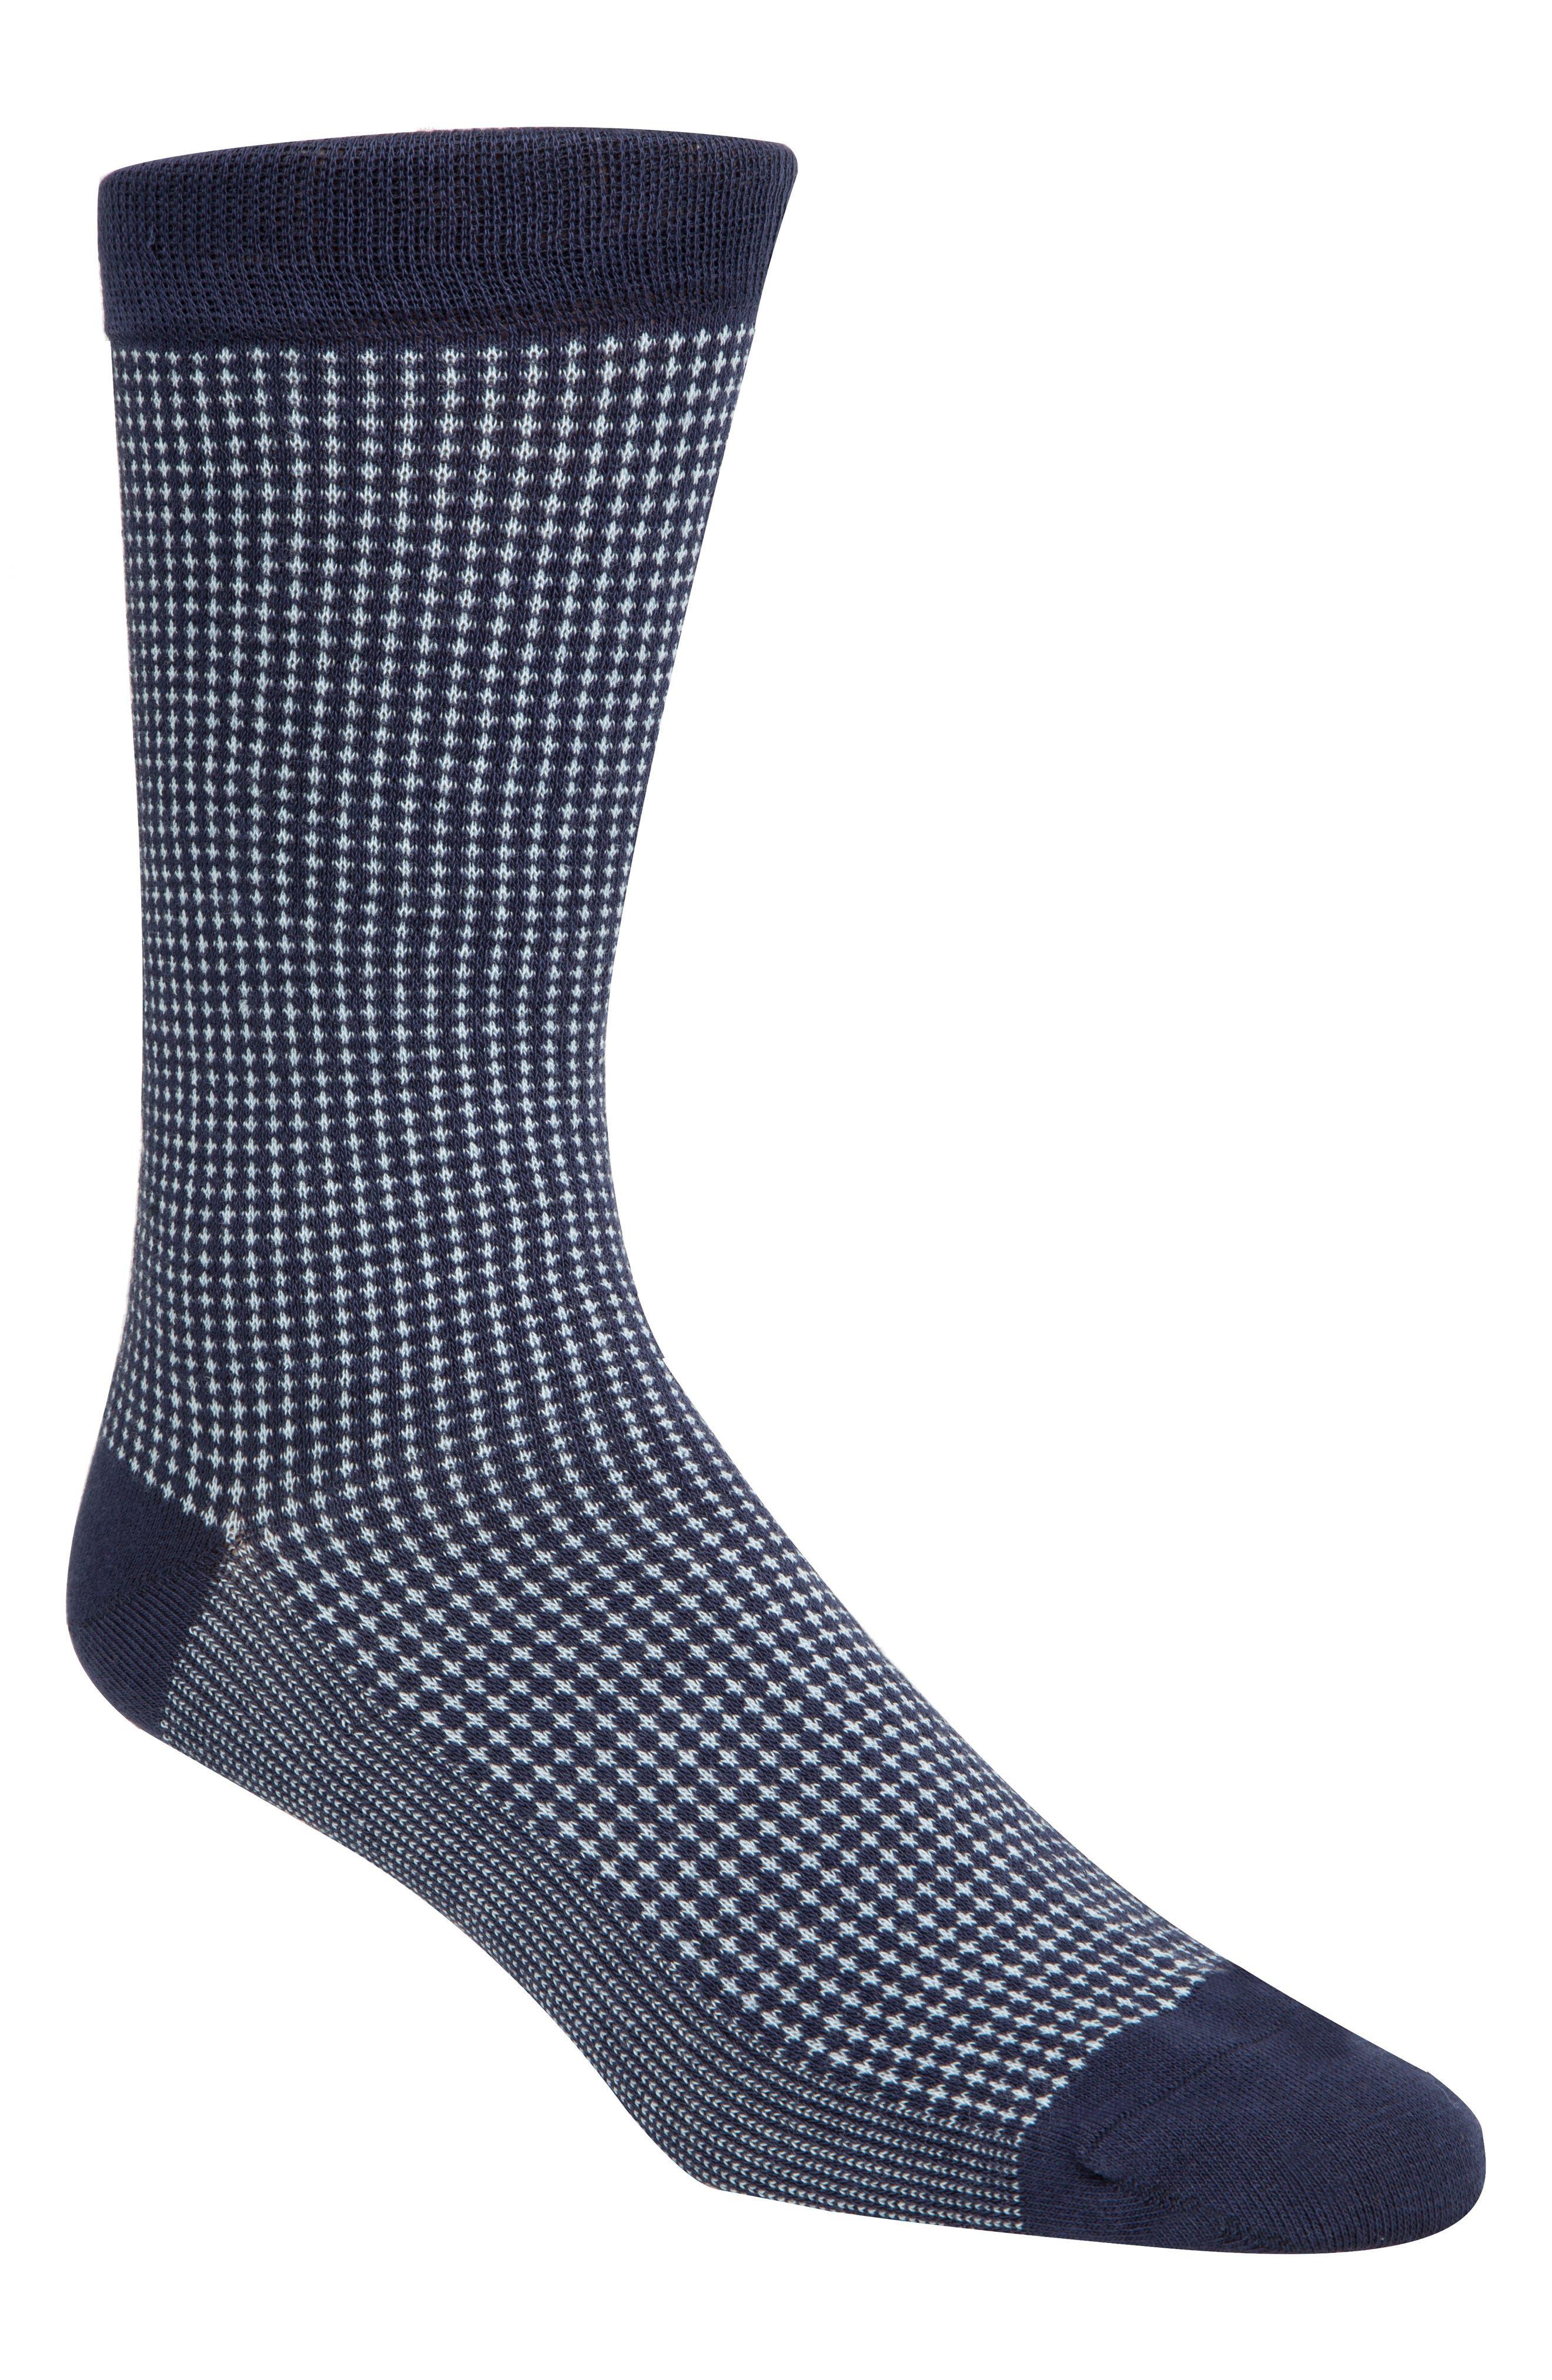 Check Socks,                         Main,                         color, MARINE BLUE